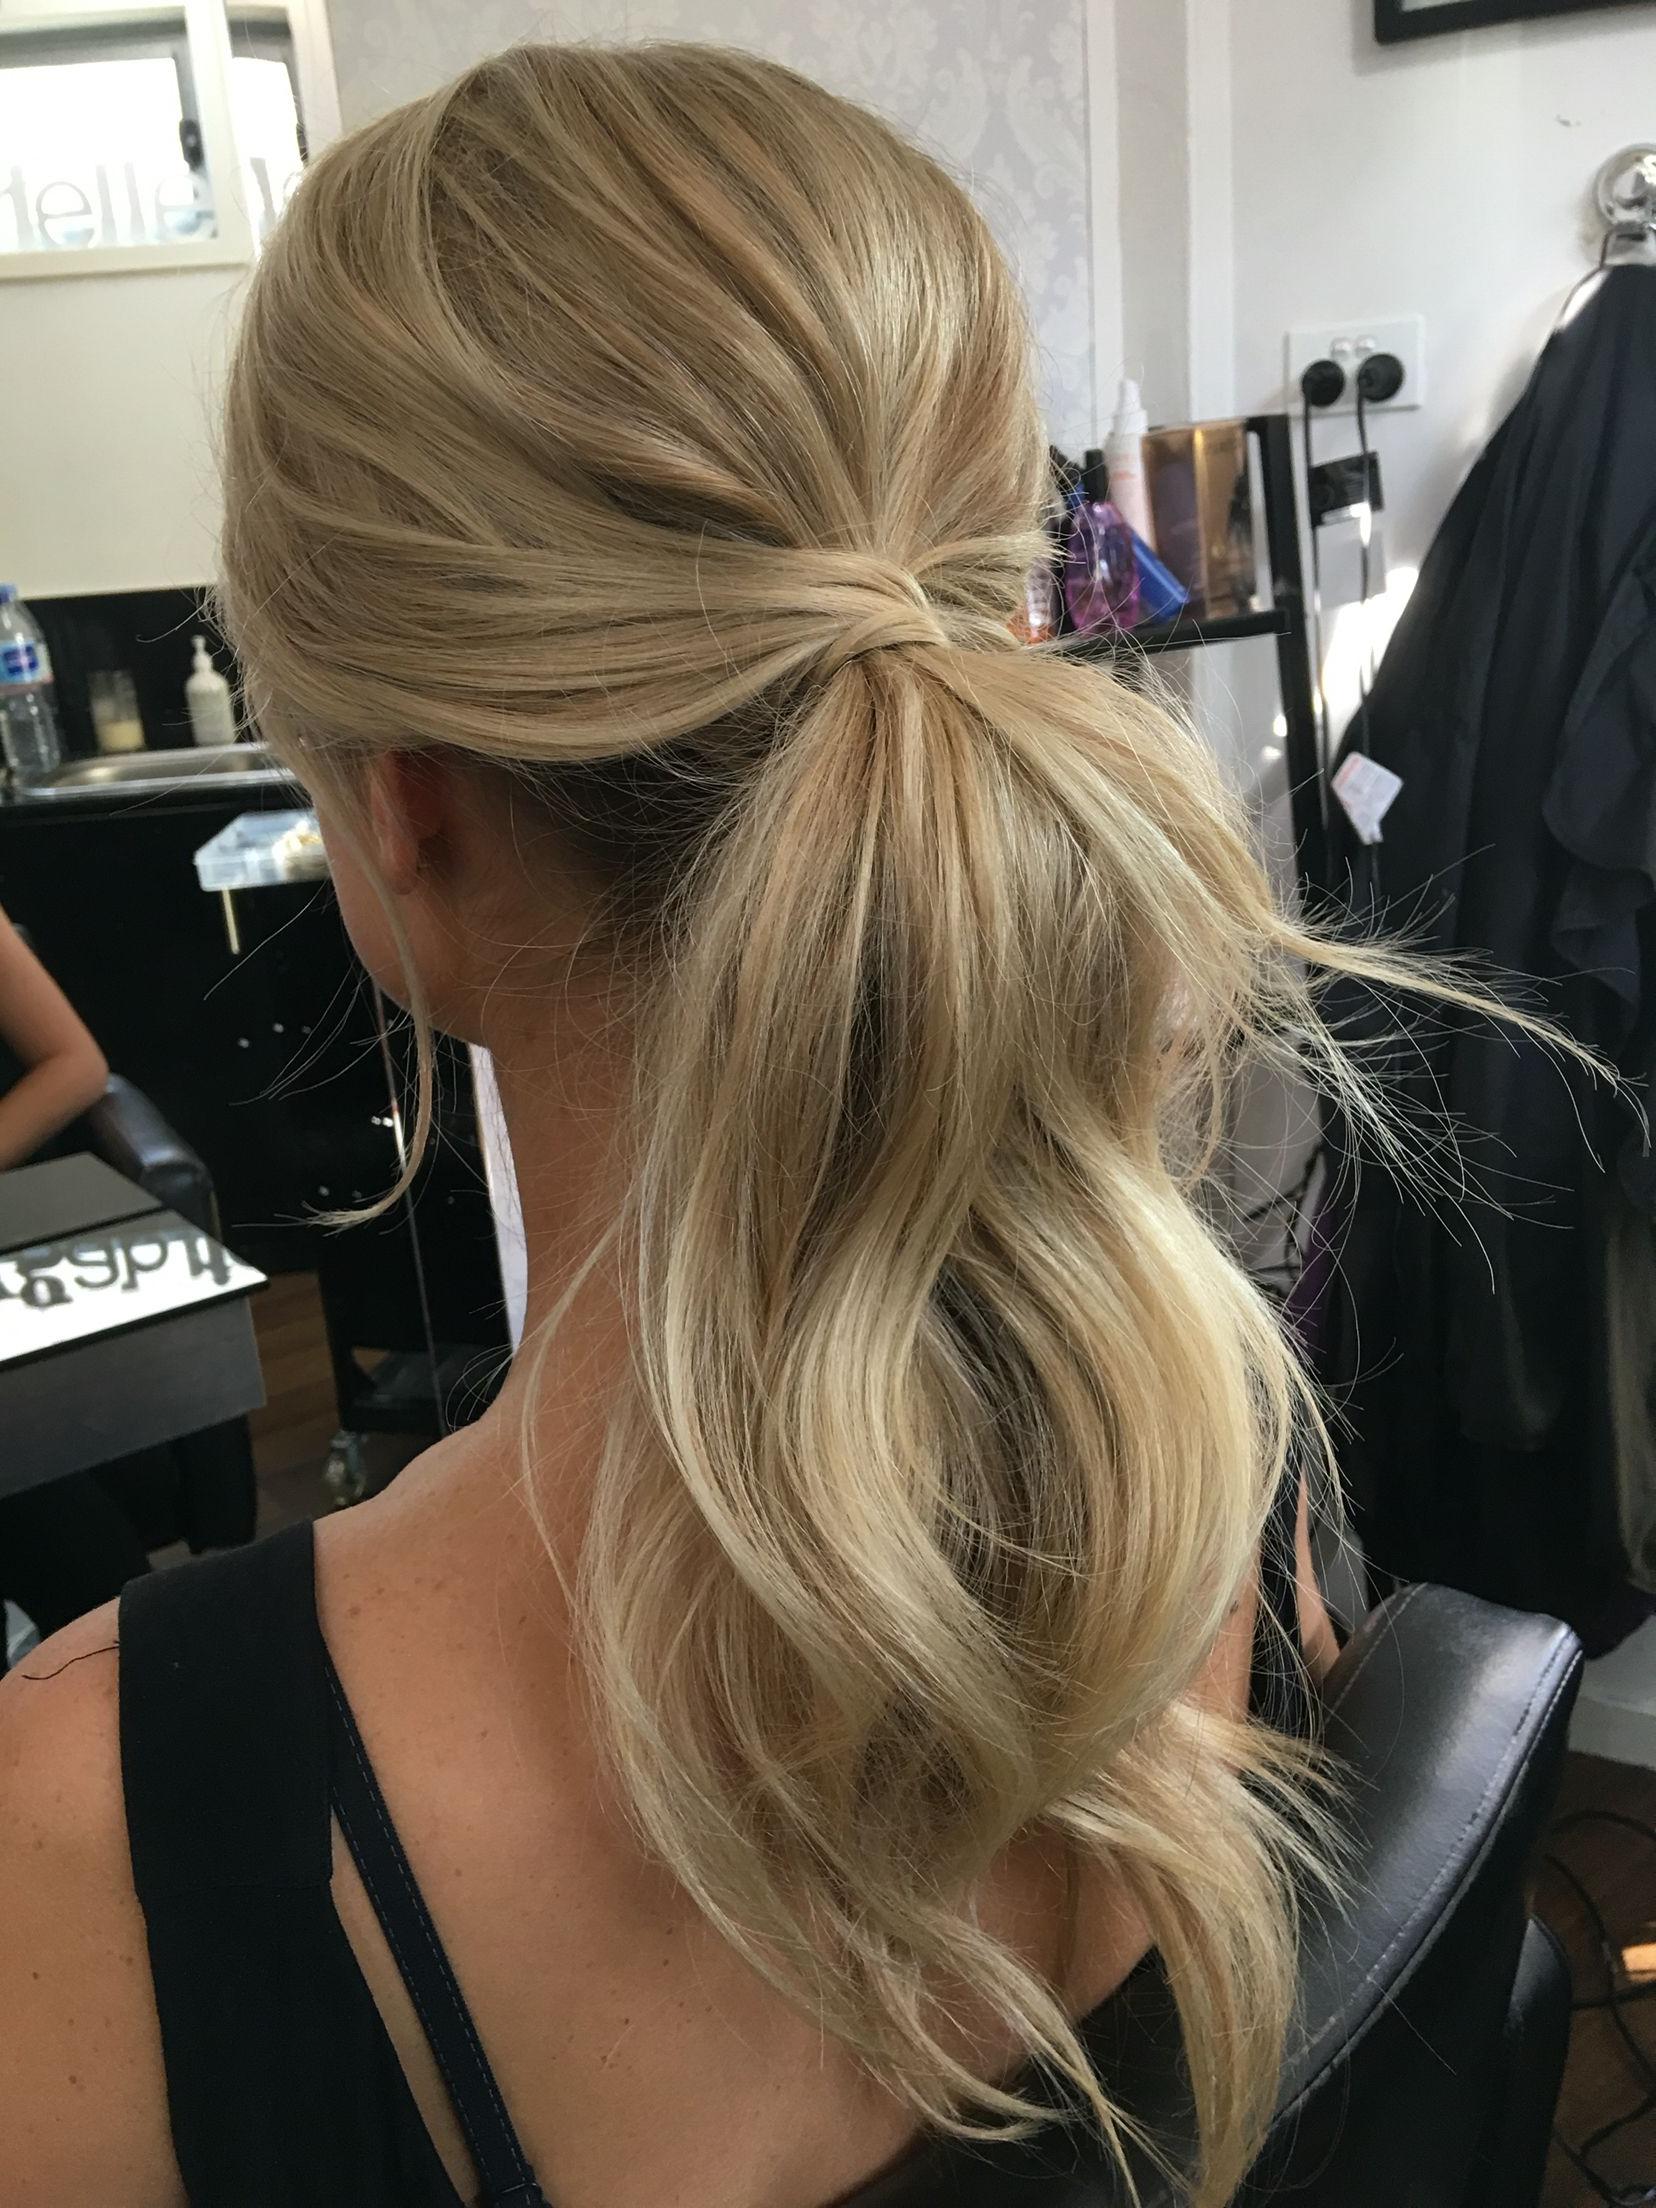 Hair Styles, Hair, Prom Hair (Gallery 15 of 20)